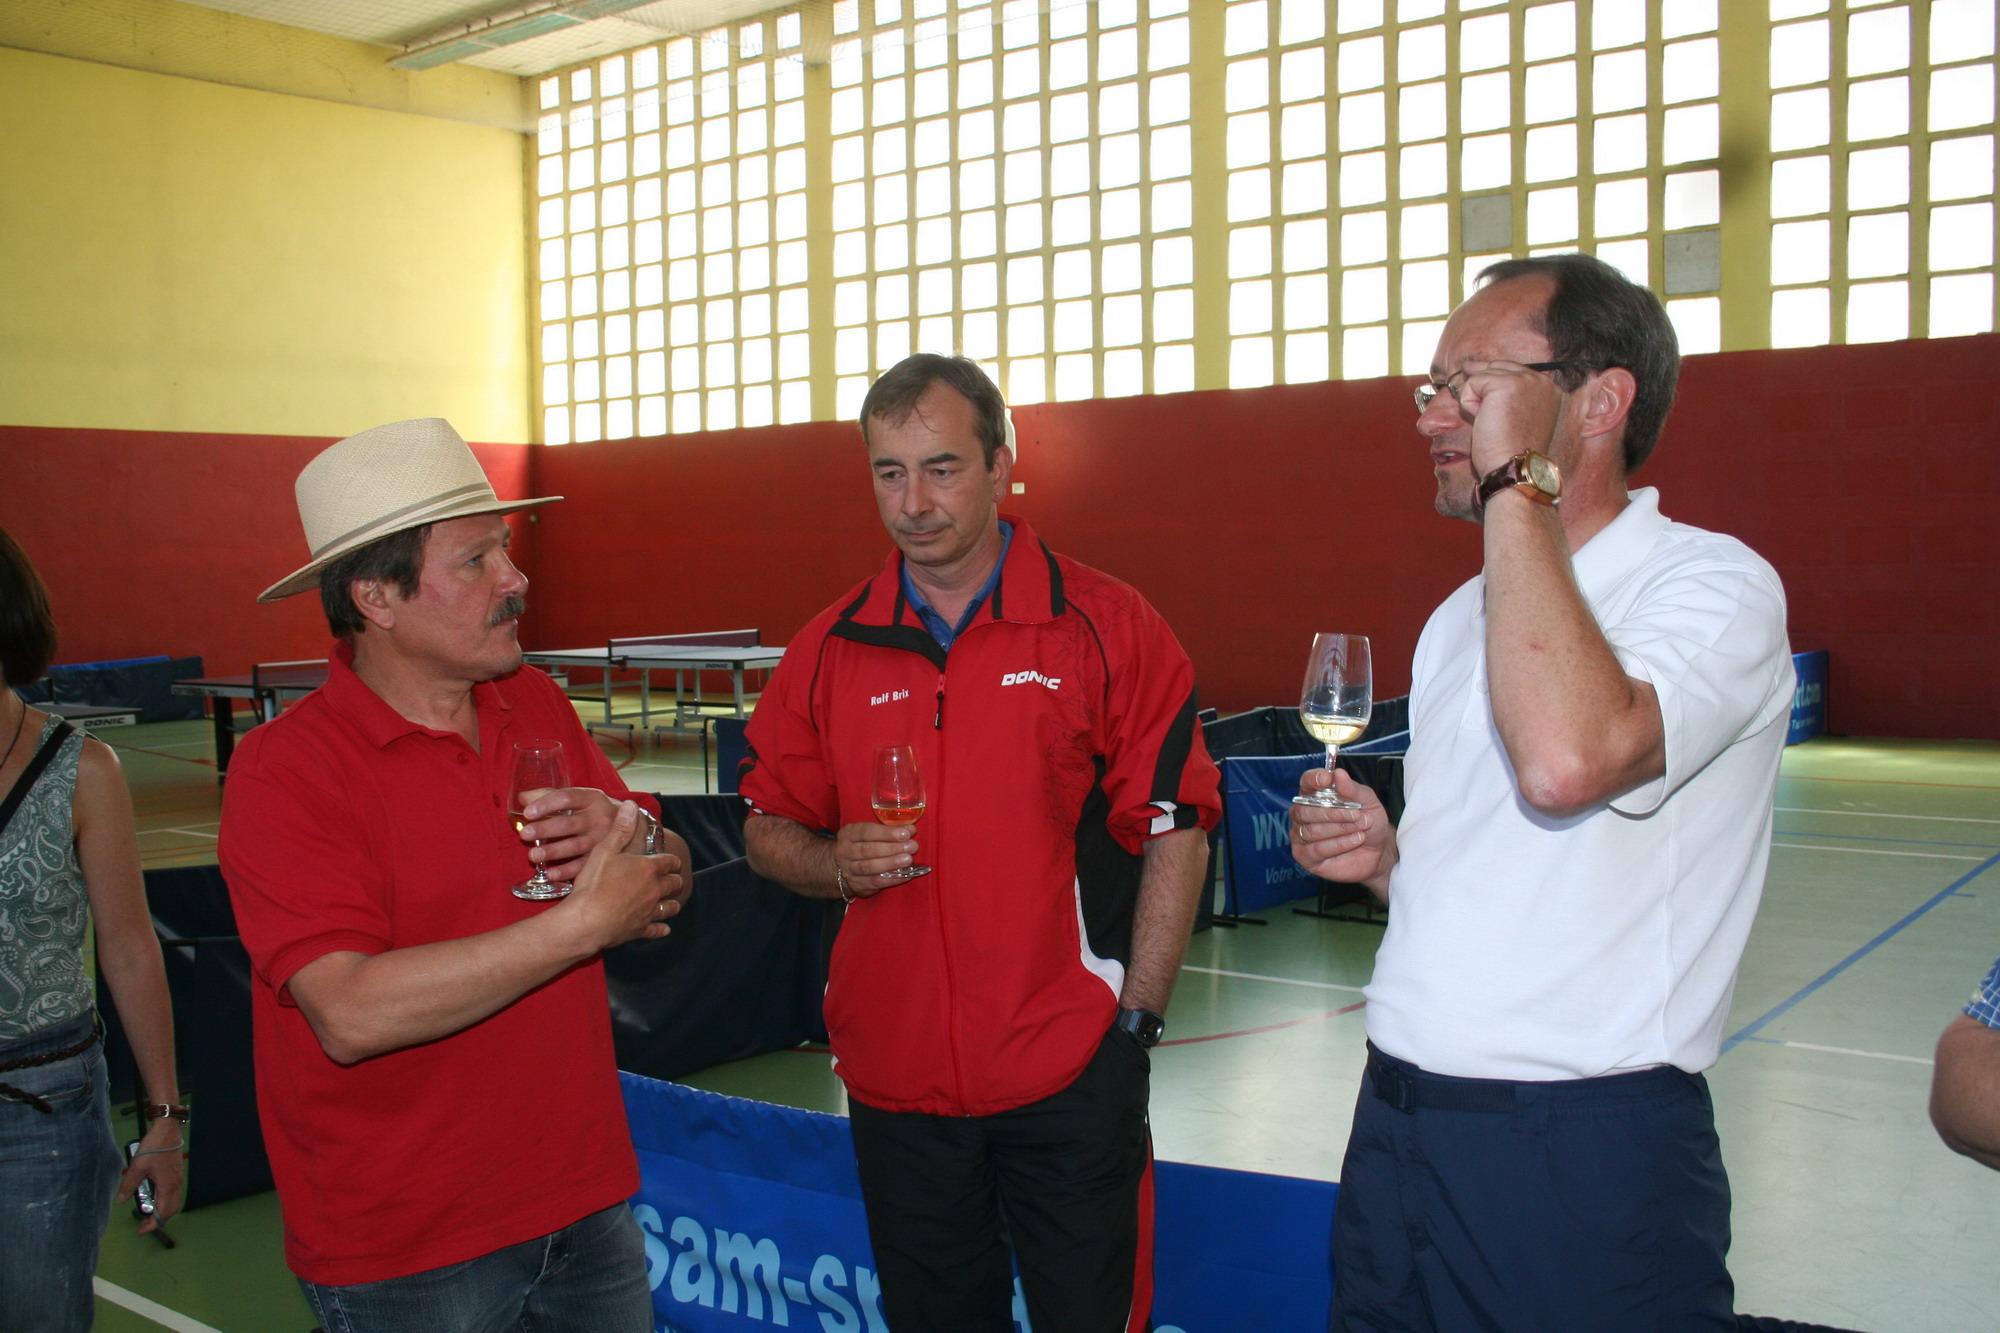 Chagny tennis de table resultats 1er tour criterium - Resultat tennis de table hainaut ...